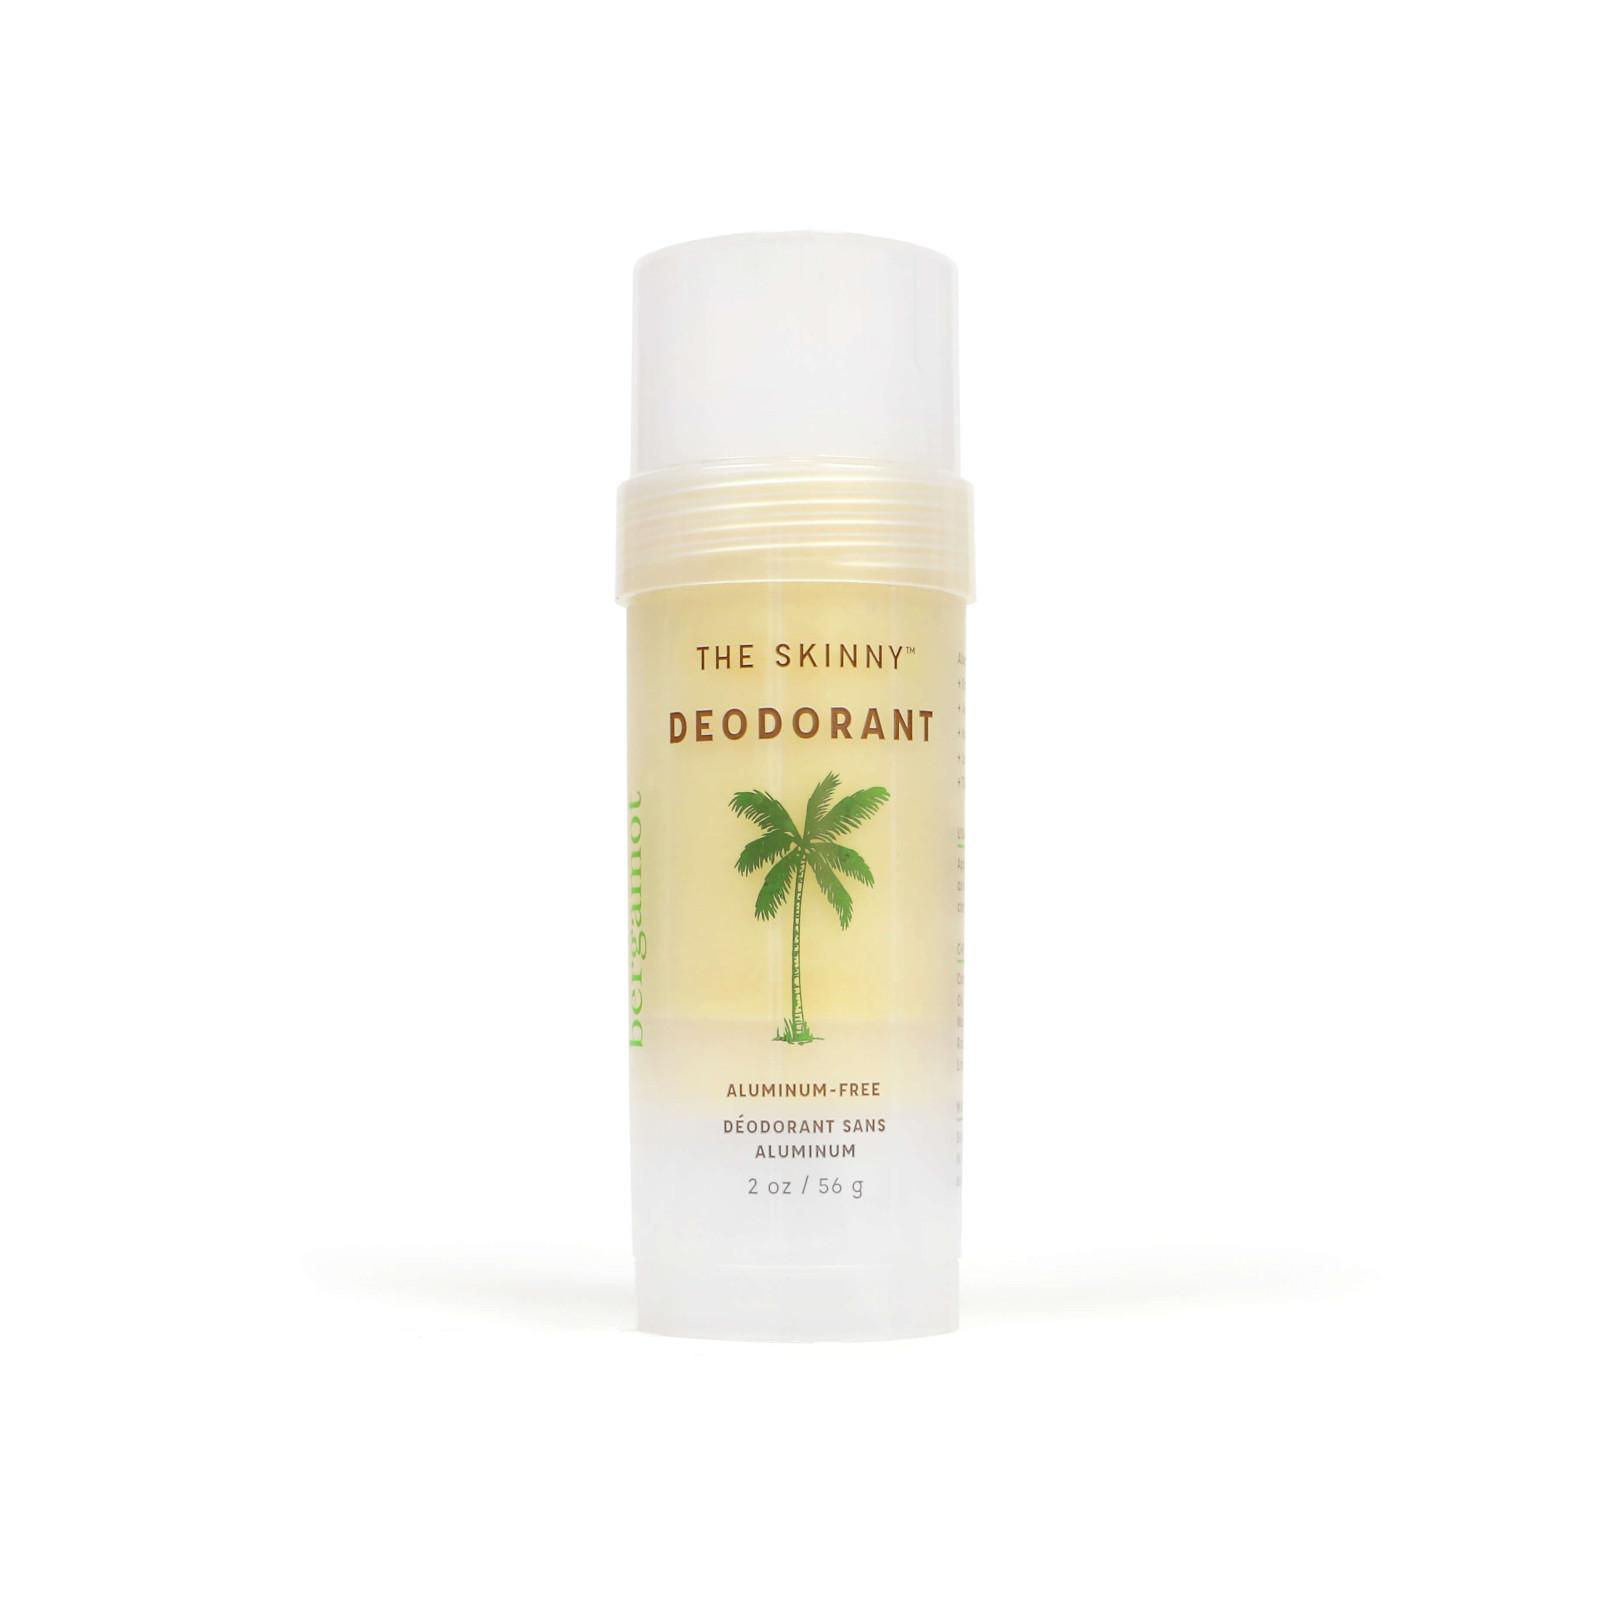 The Skinny Raw deodorant bergamot 56 g